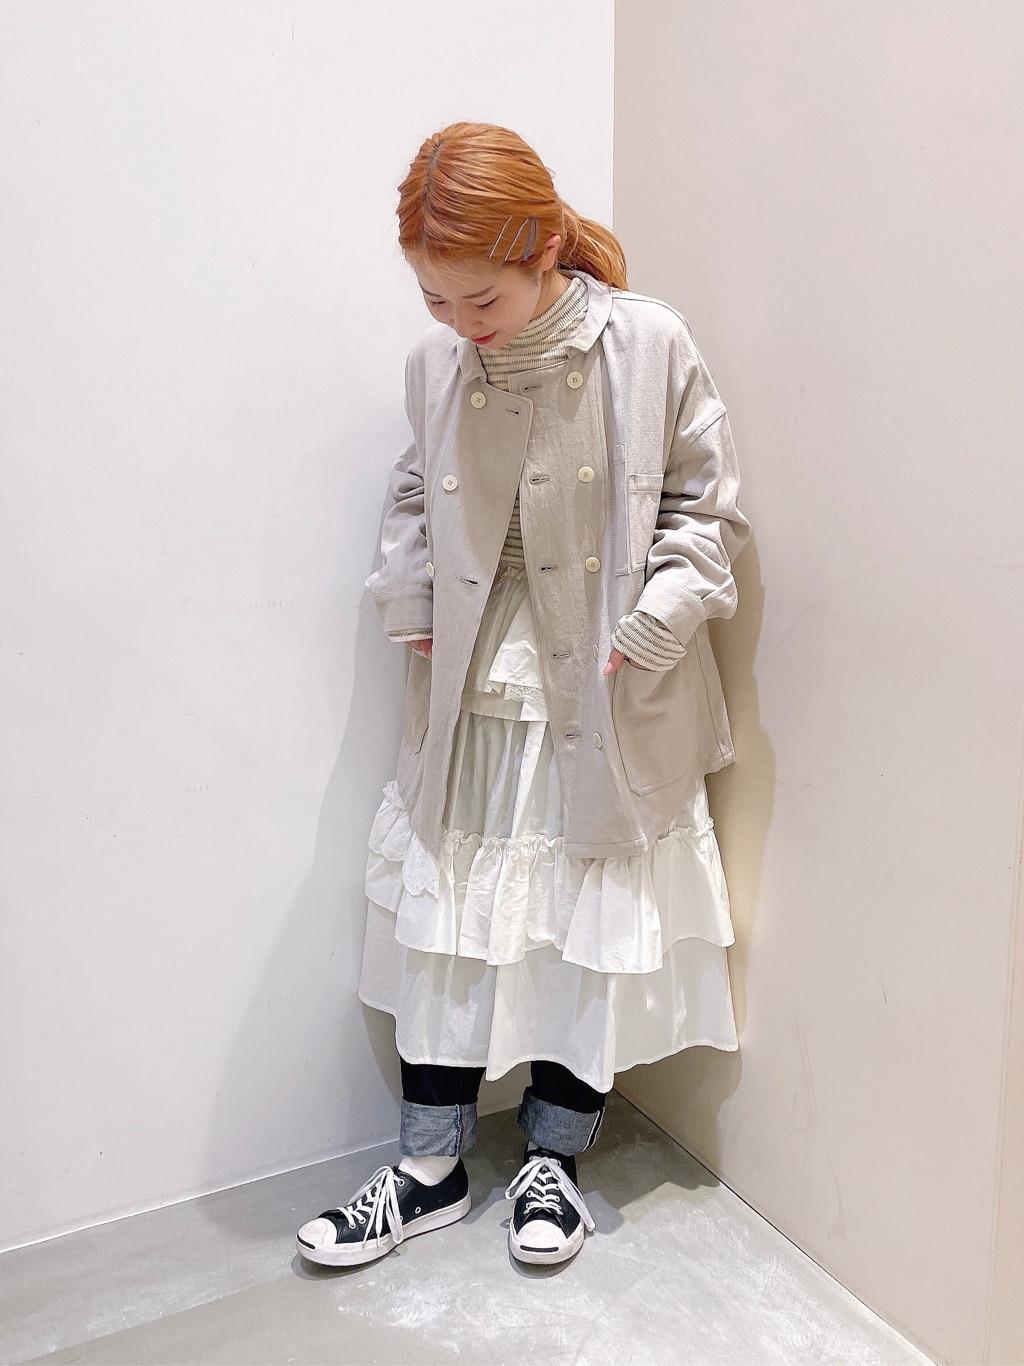 bulle de savon 阪急西宮ガーデンズ 身長:152cm 2021.04.06